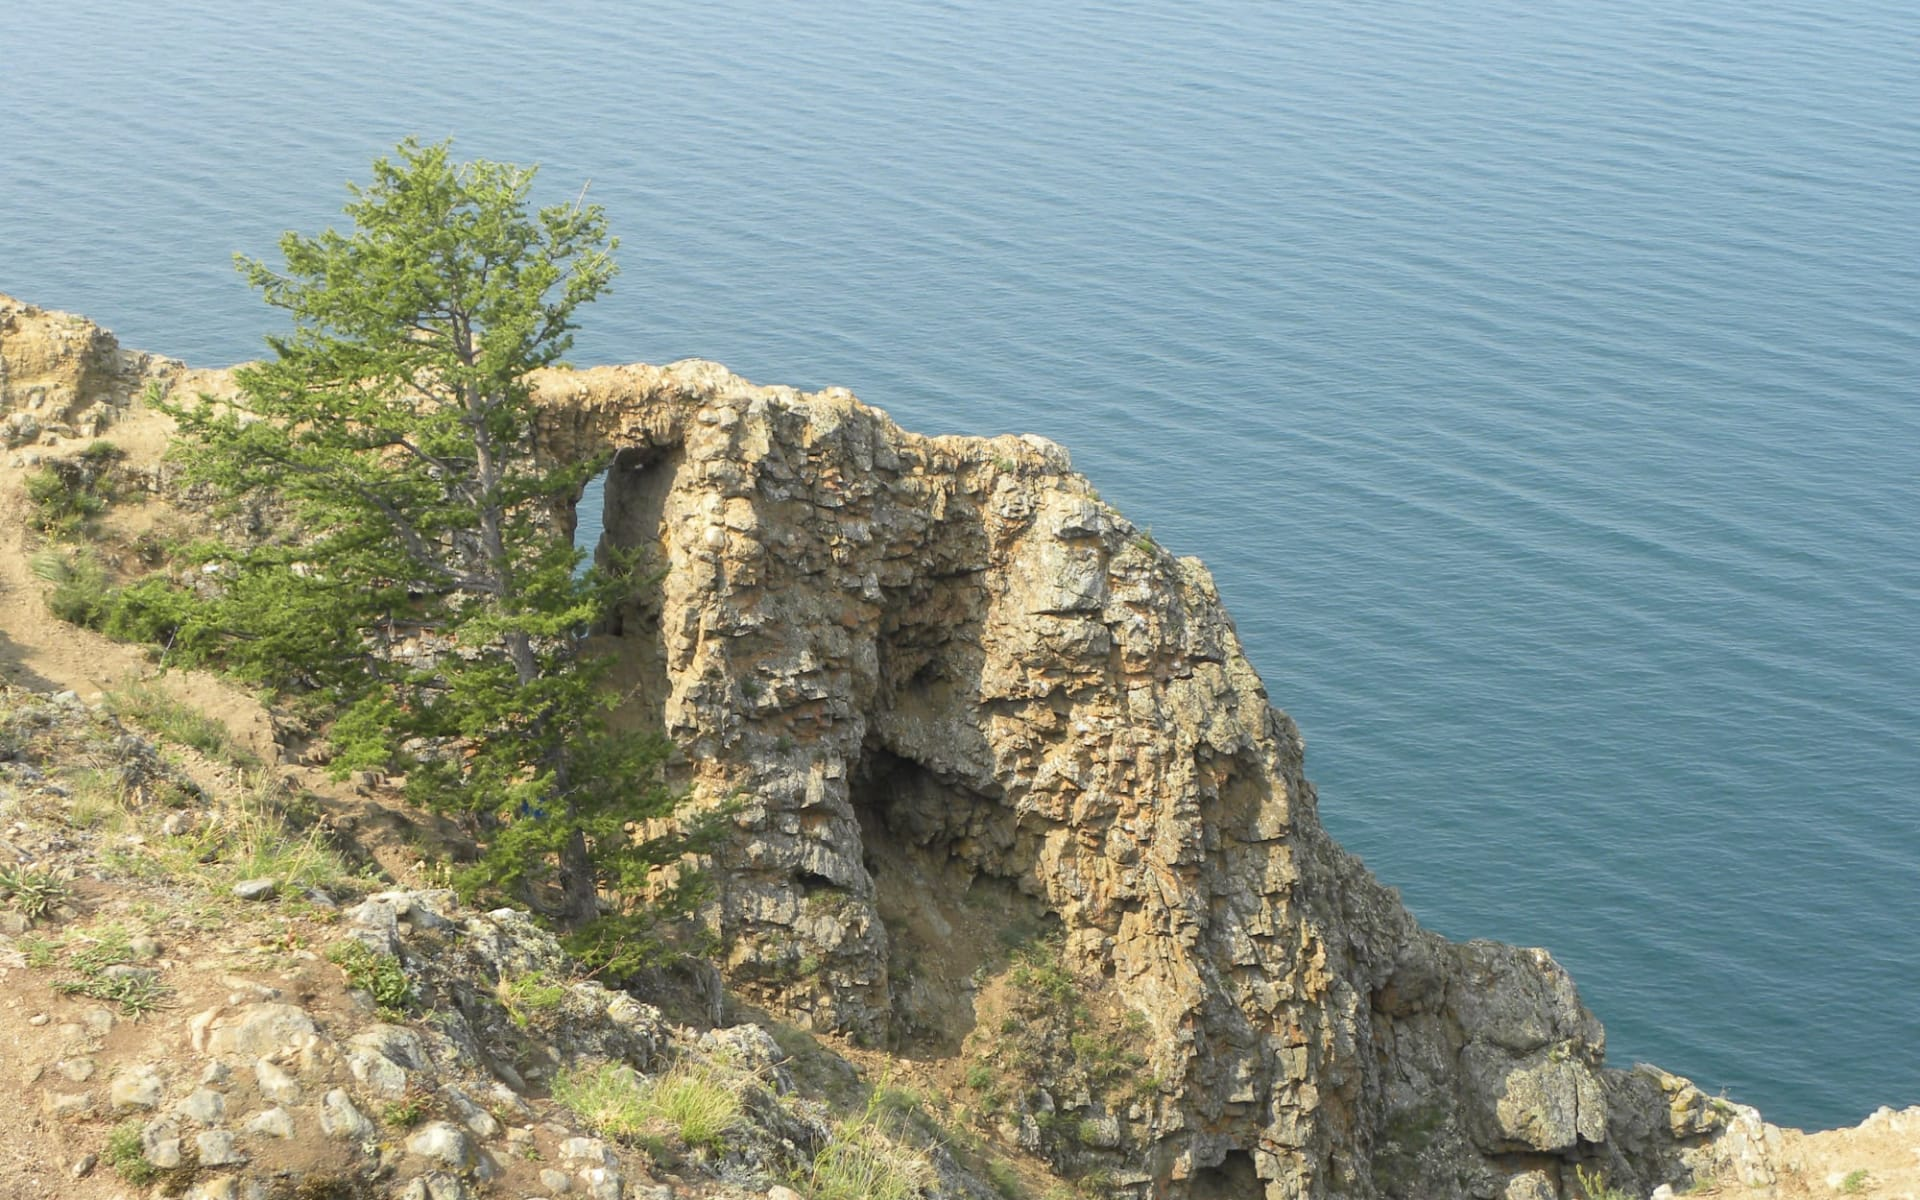 Naturwunder Baikalsee ab Irkutsk: Russland - Baikalsee - Olchon